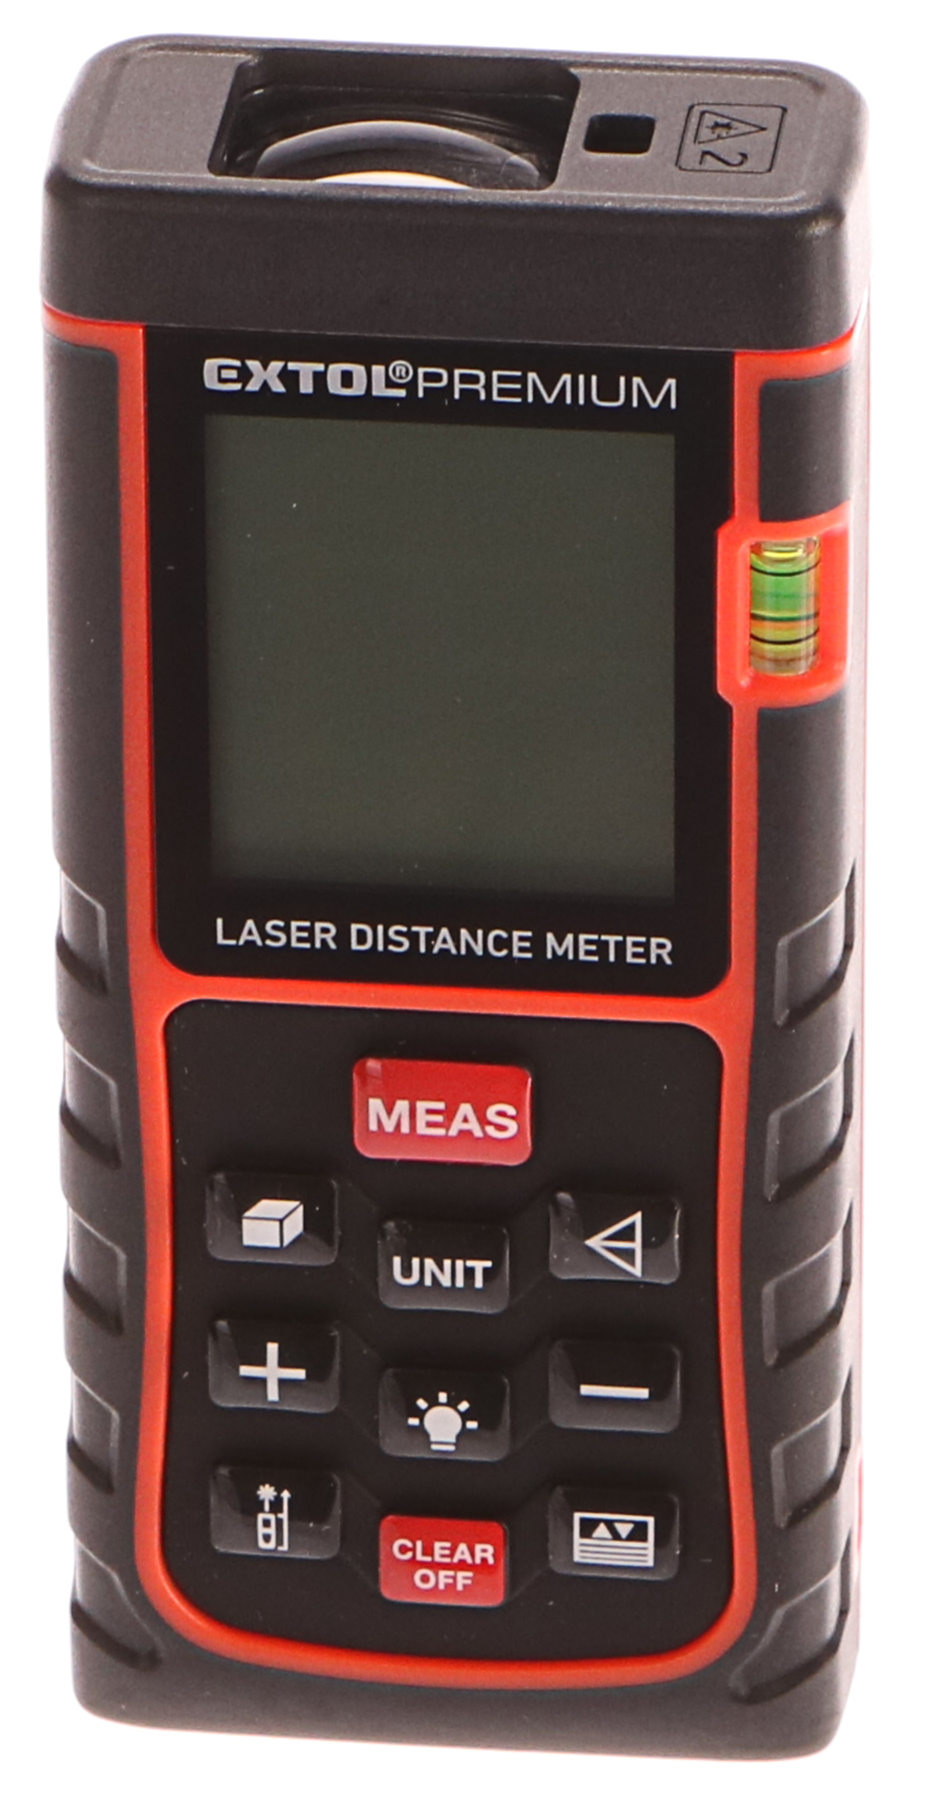 Metr laserový digitální, 0,05-40m EXTOL-PREMIUM